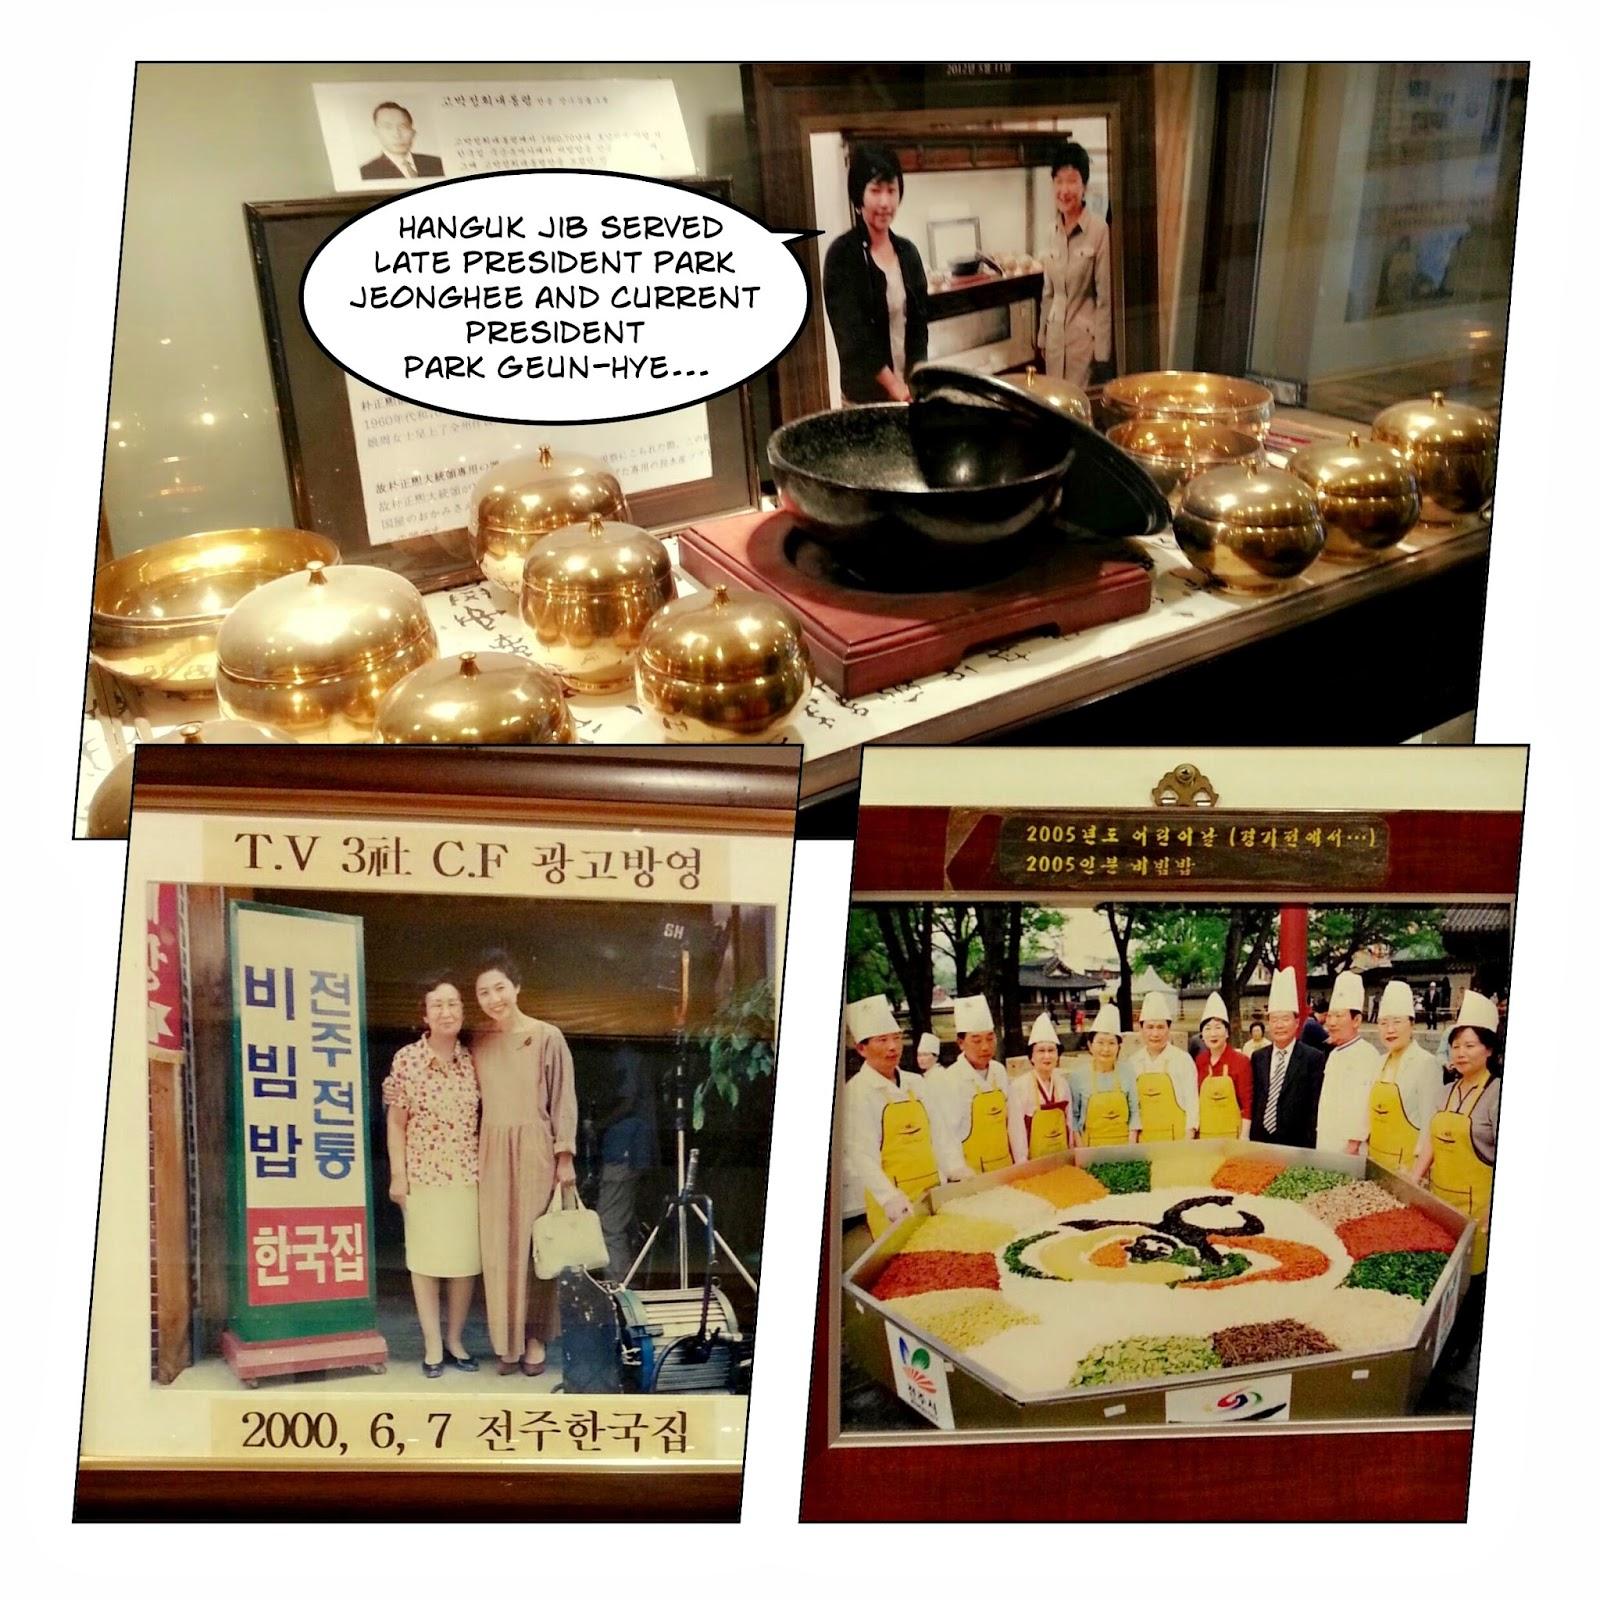 Jeonju Hanguk Jip Jeonju Bibimbap 한국집 전주 전통 비빔밥 | meheartseoul.blogspot.com